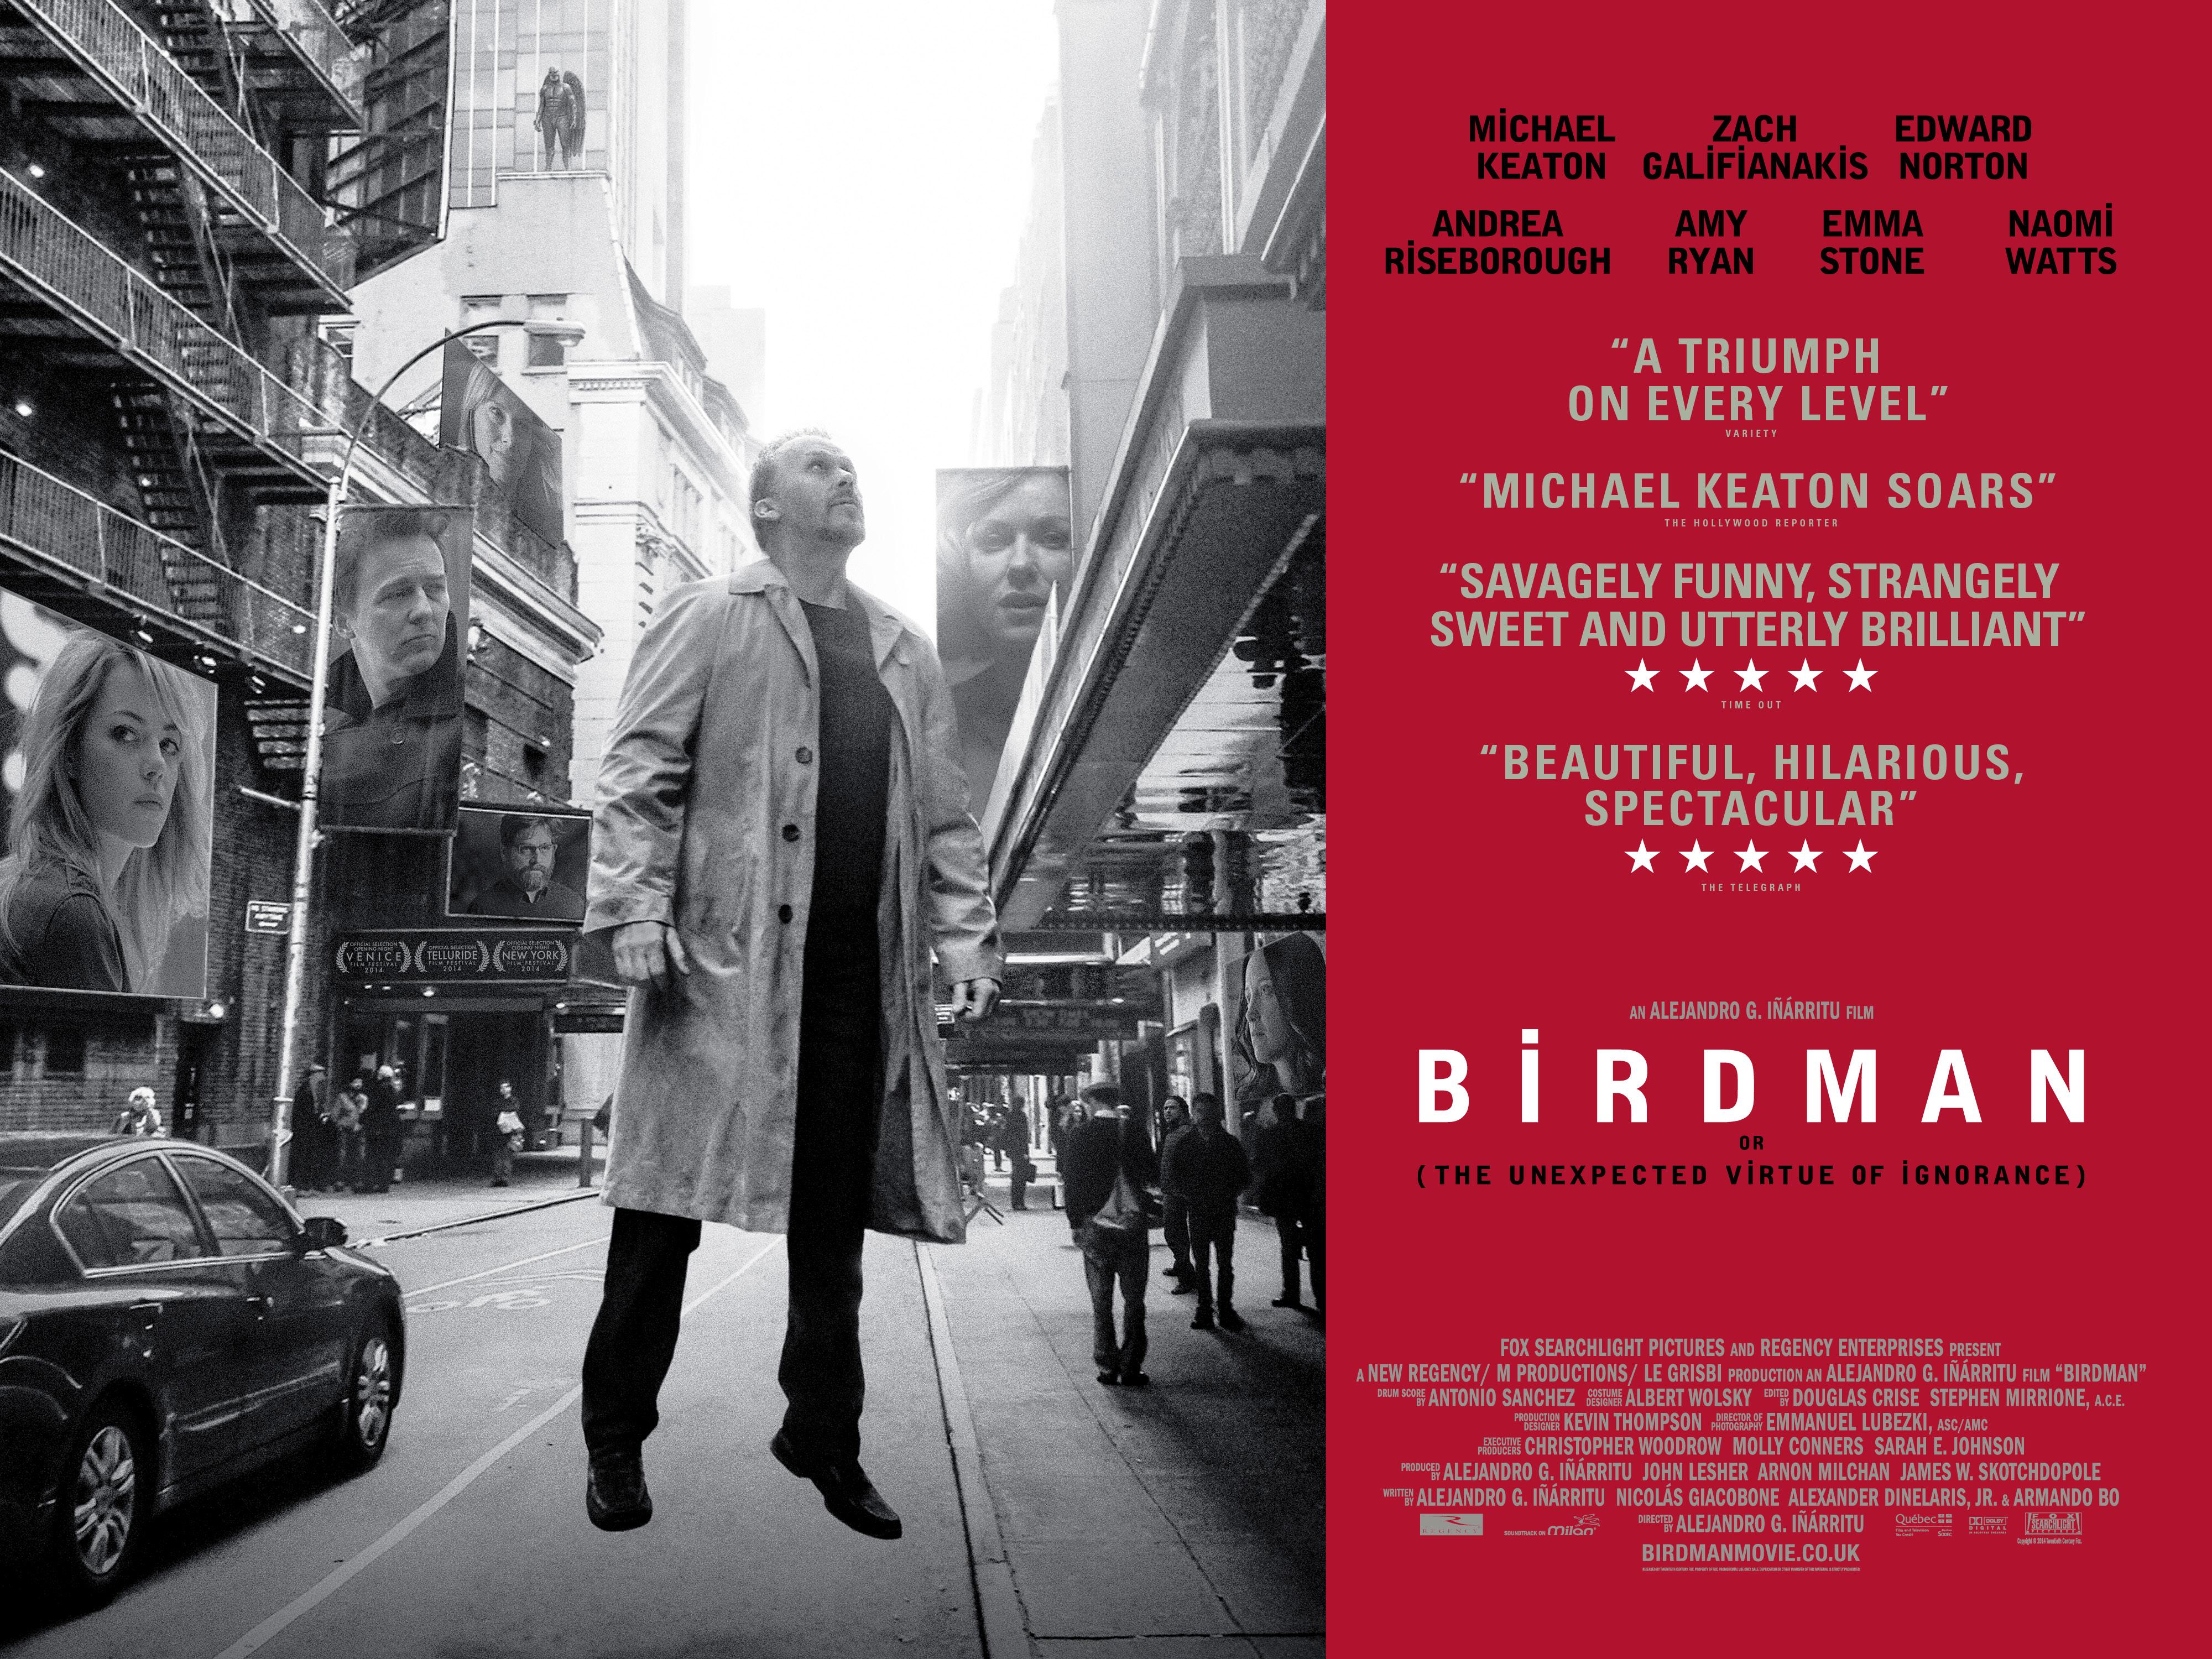 Birdman Hd 2015 Торрент